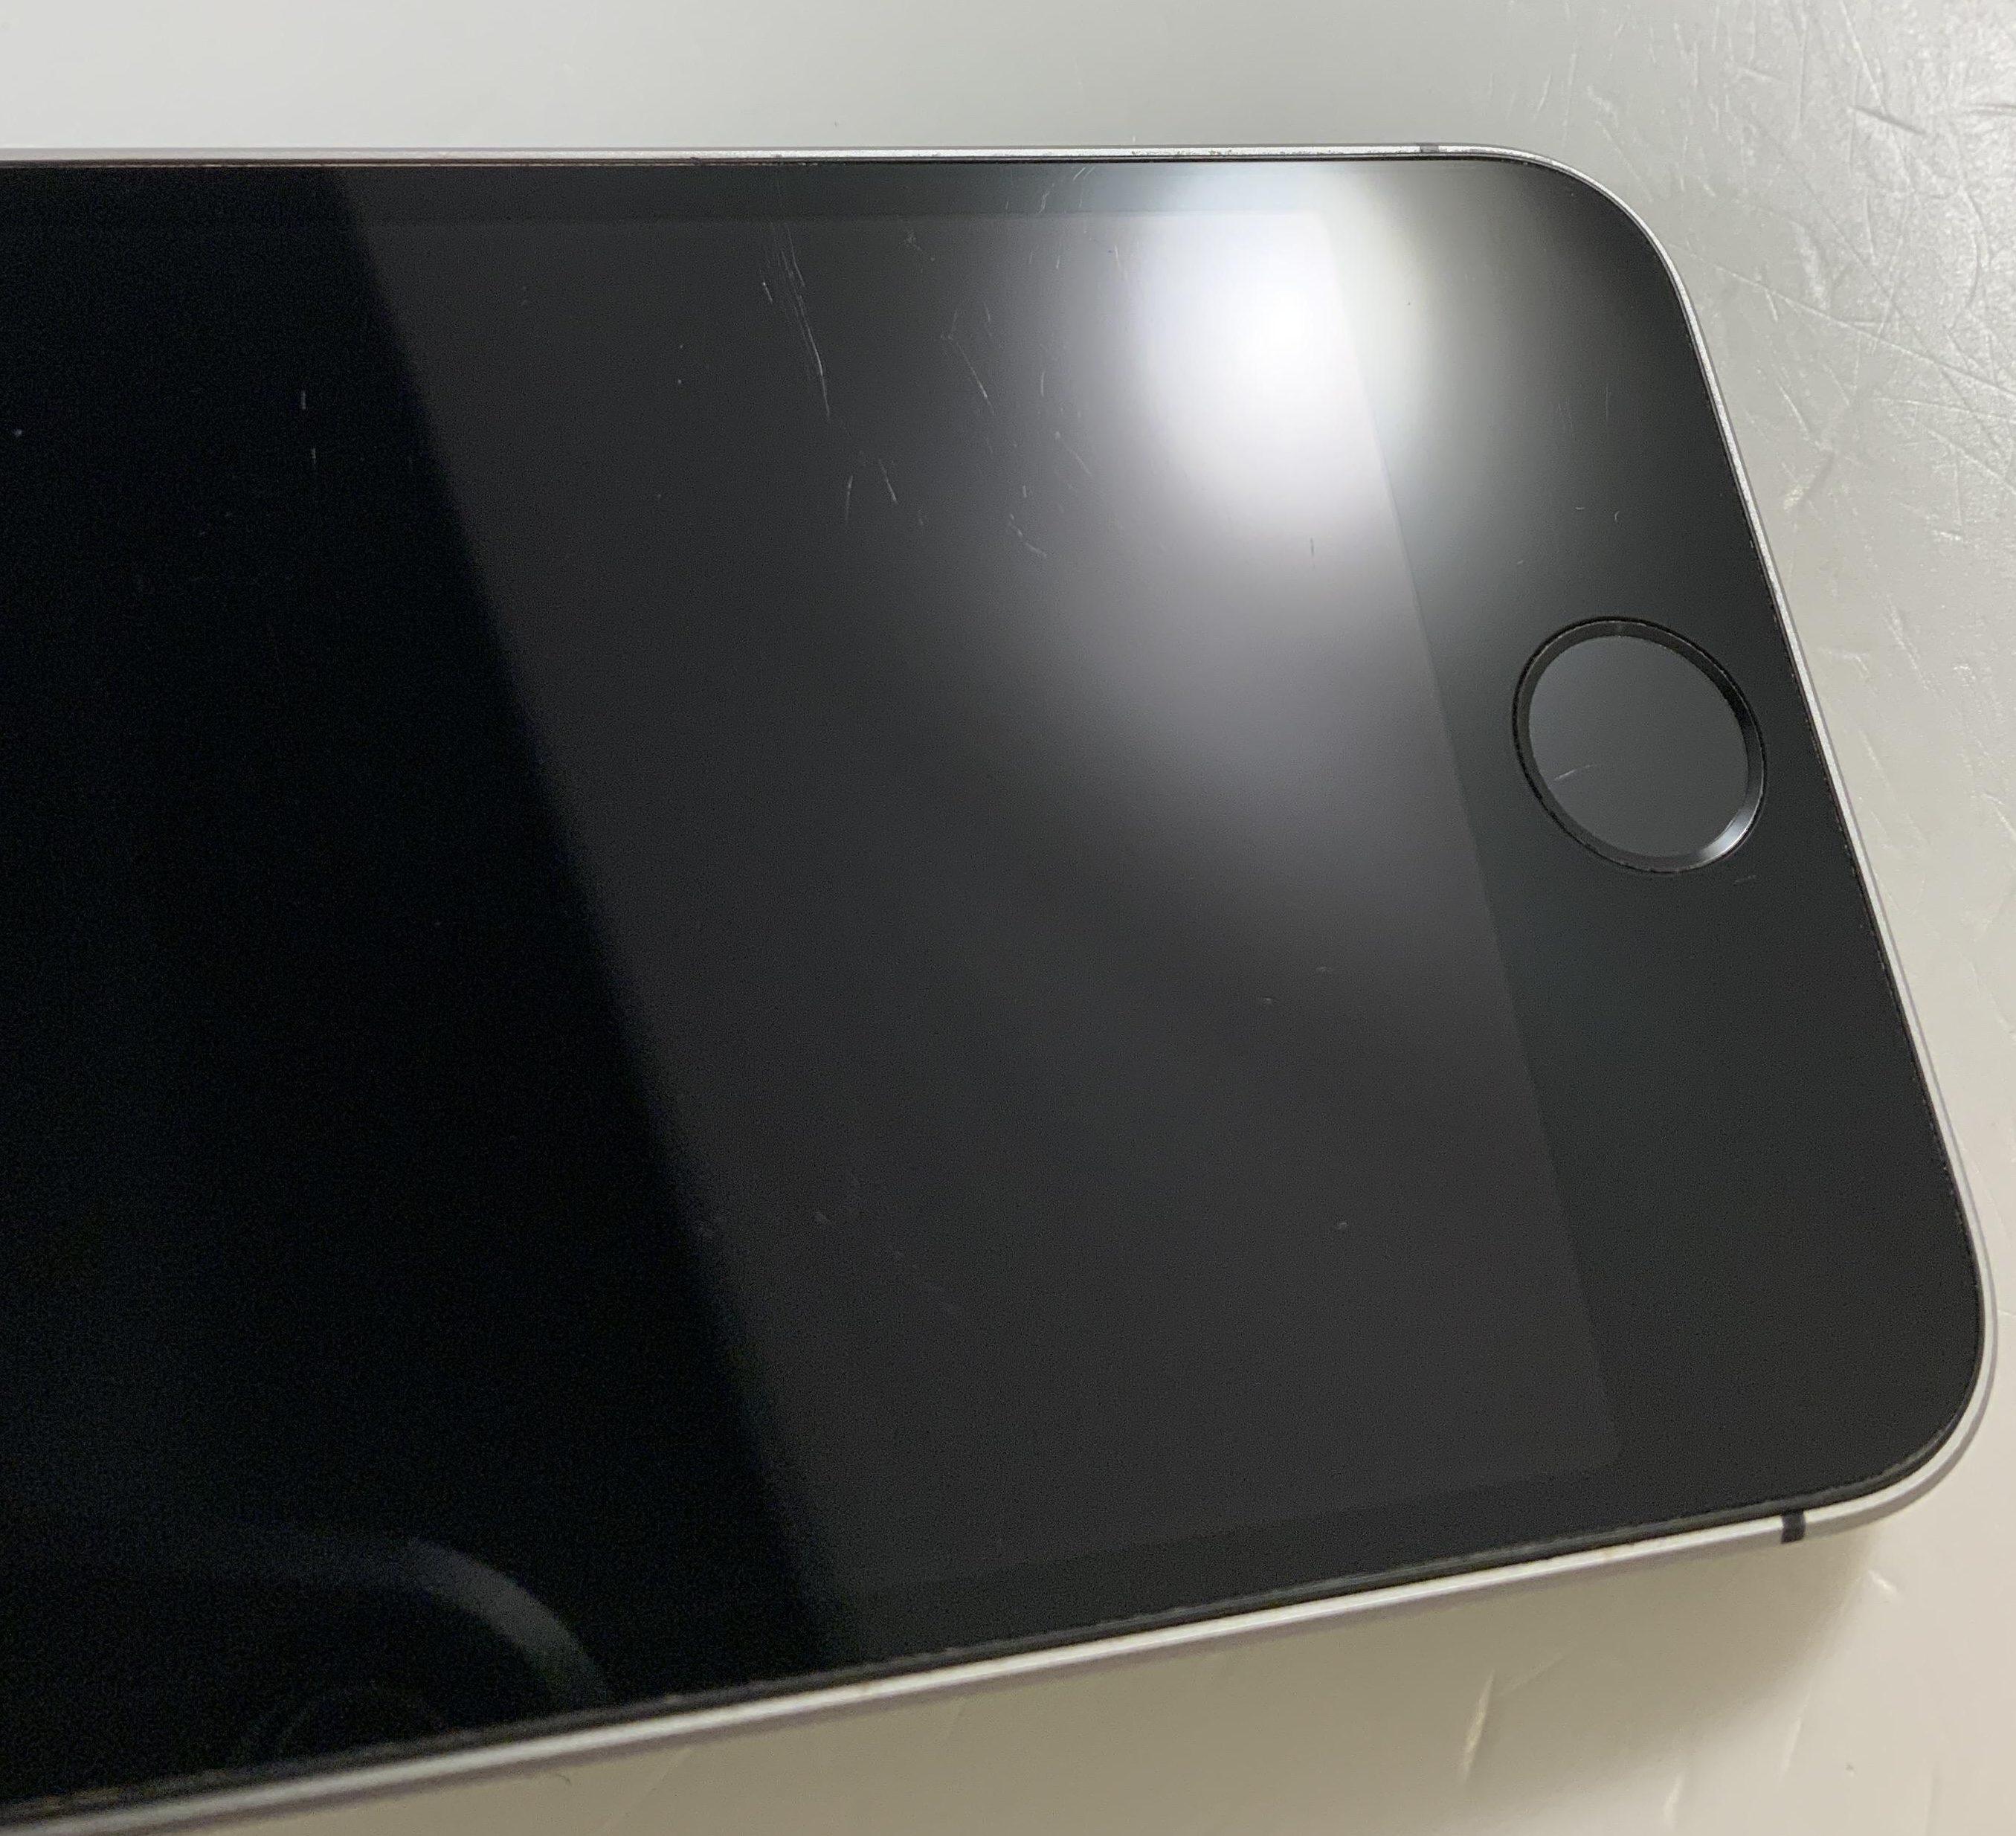 iPhone SE 32GB, 32GB, Space Gray, image 3